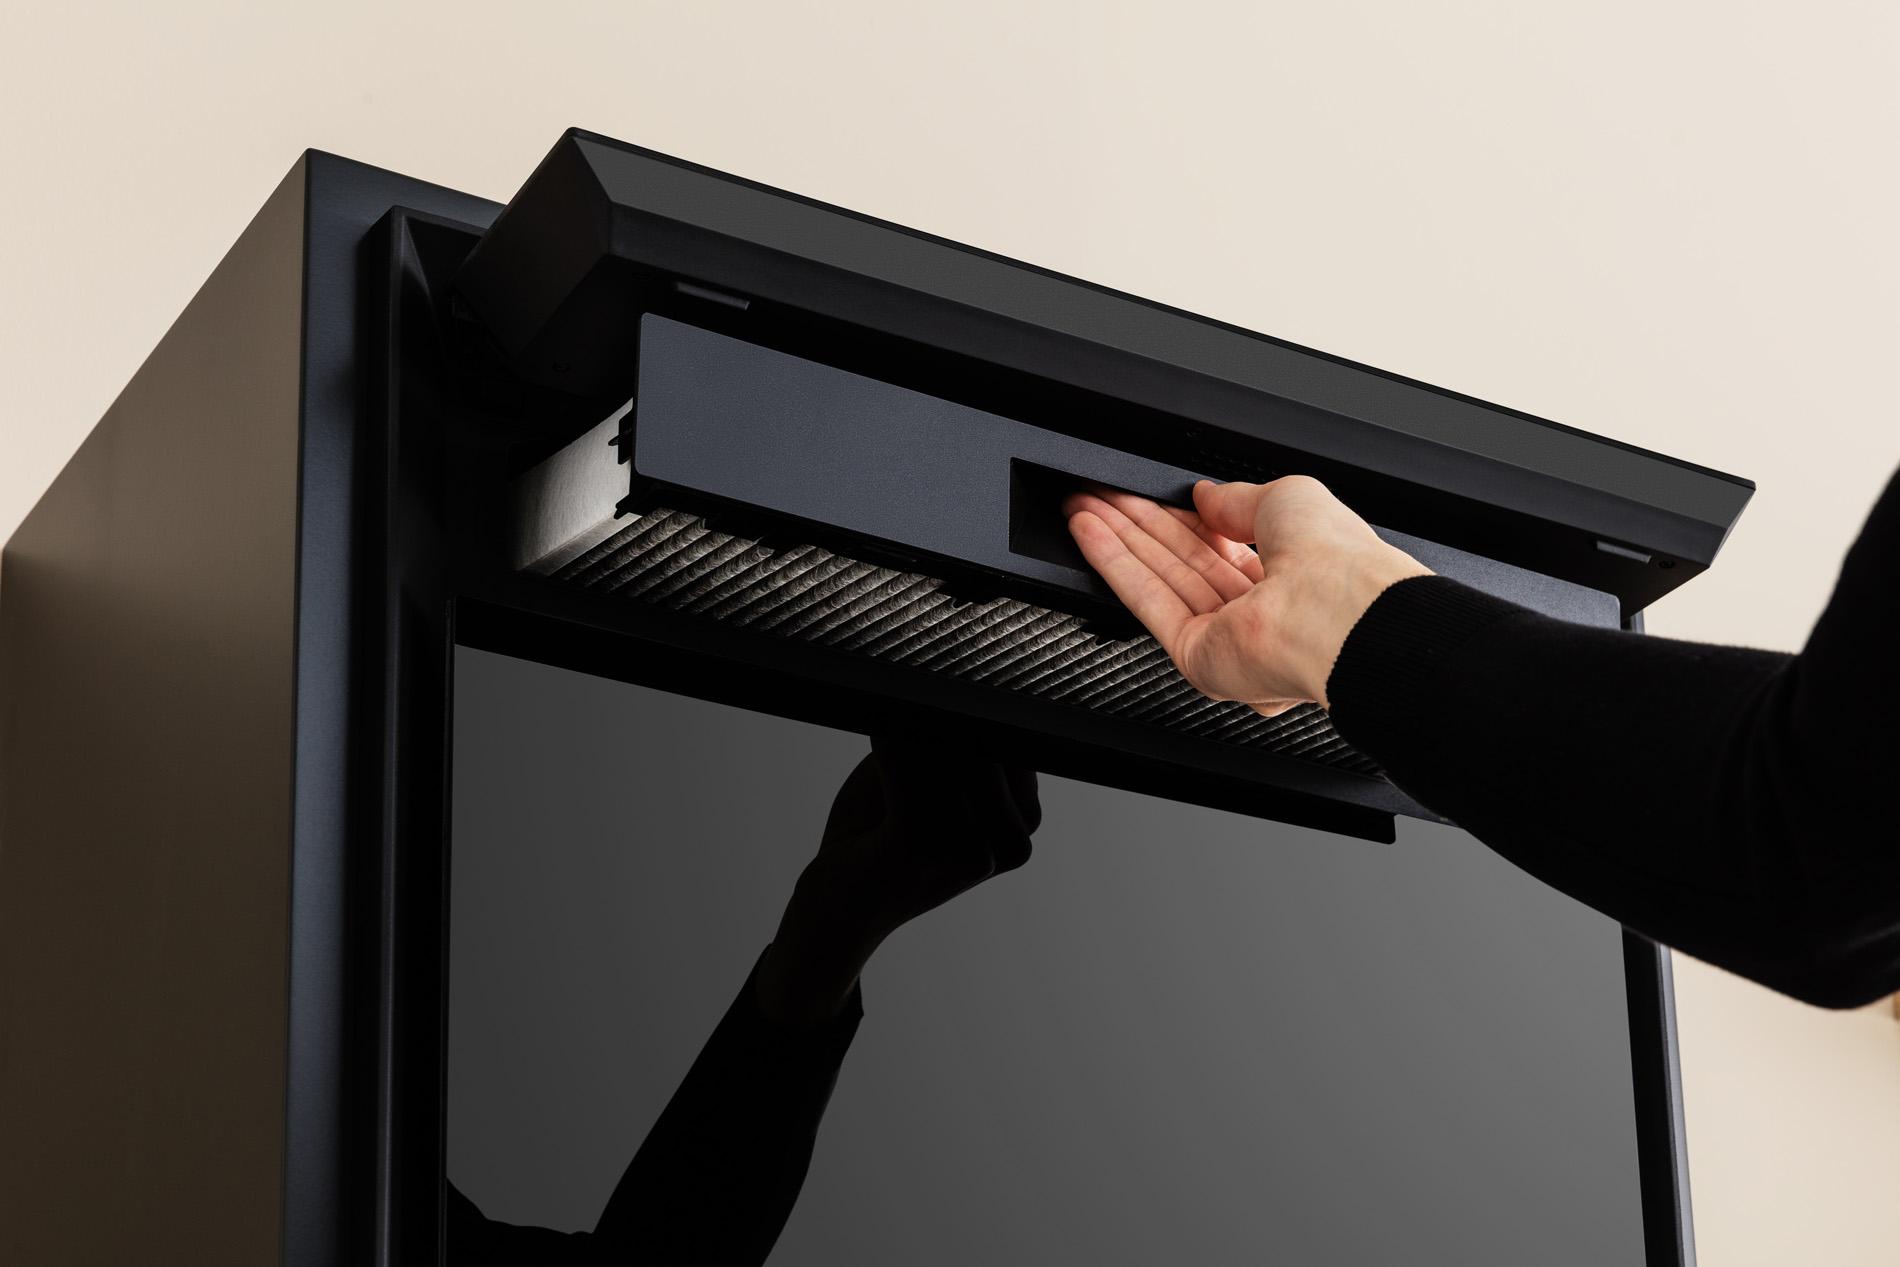 BORA X BO luxe oven met filter, Keukenapparatuur ASWA Keukens